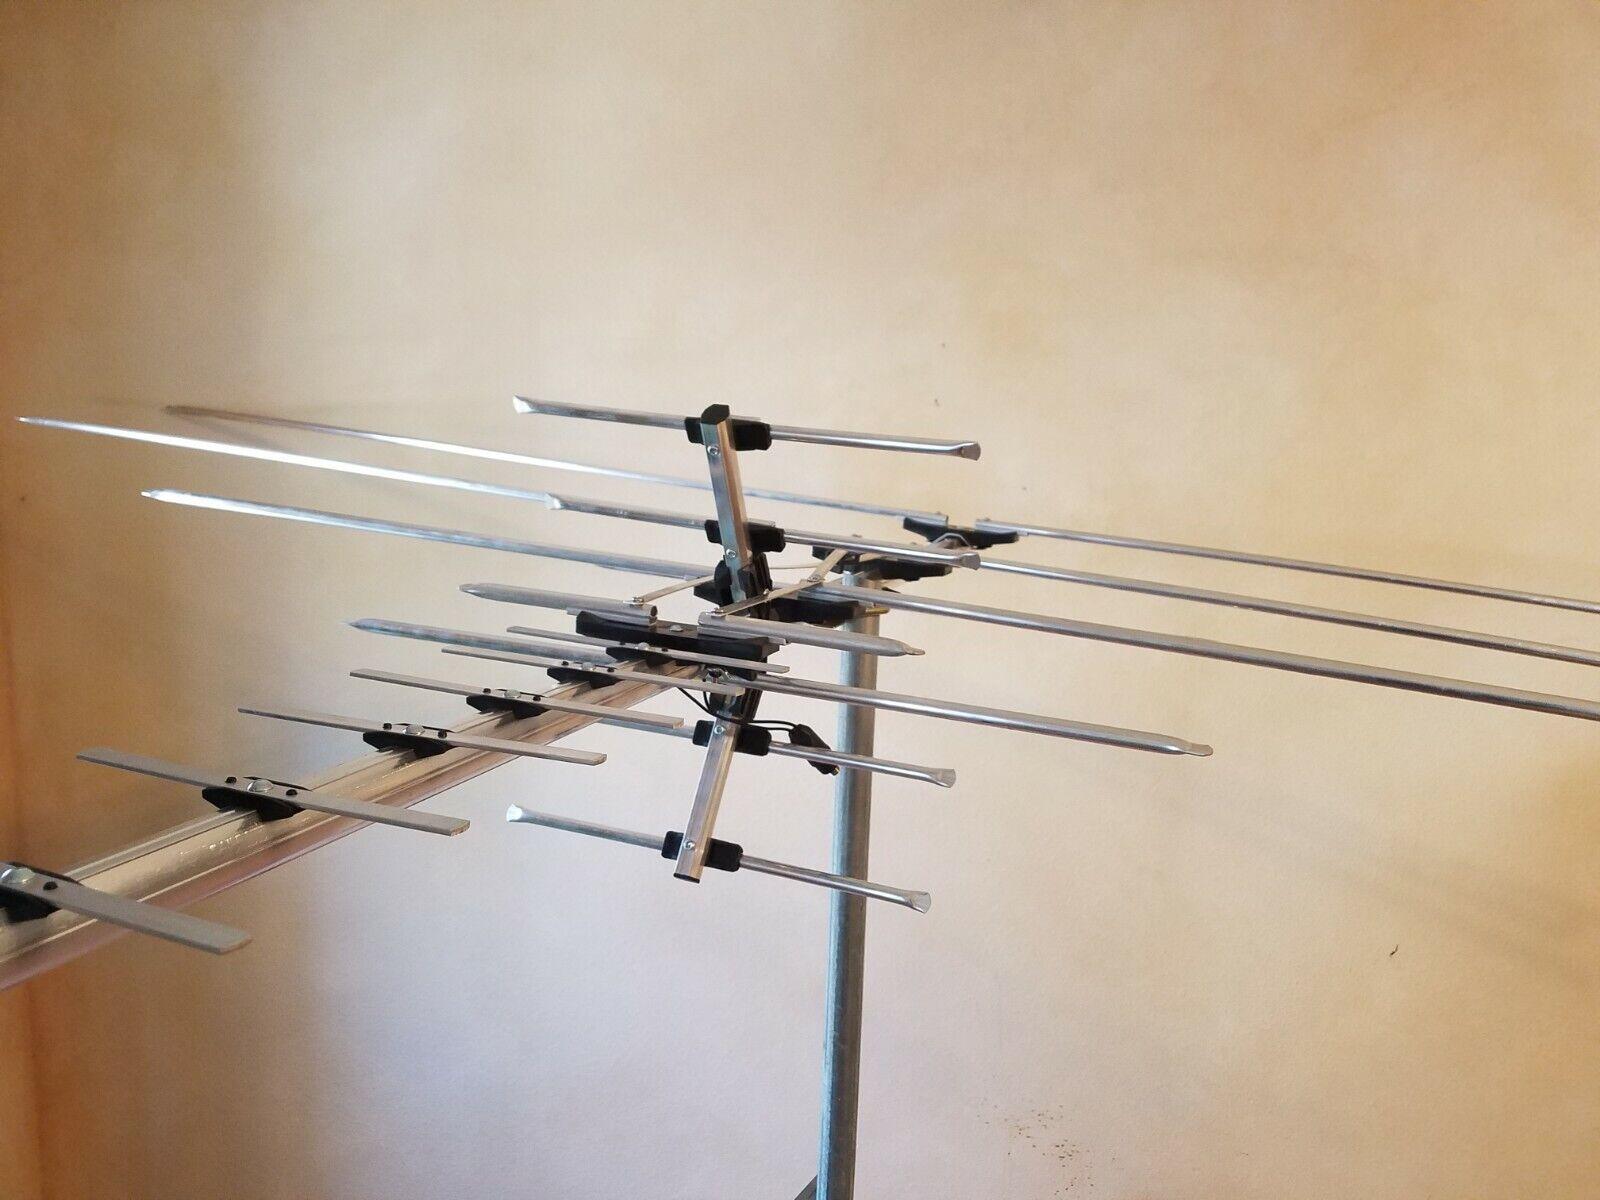 Super HD TV MAX HD Antenna HDTV FREE Digital Channels Magic Stick 20ft Cable